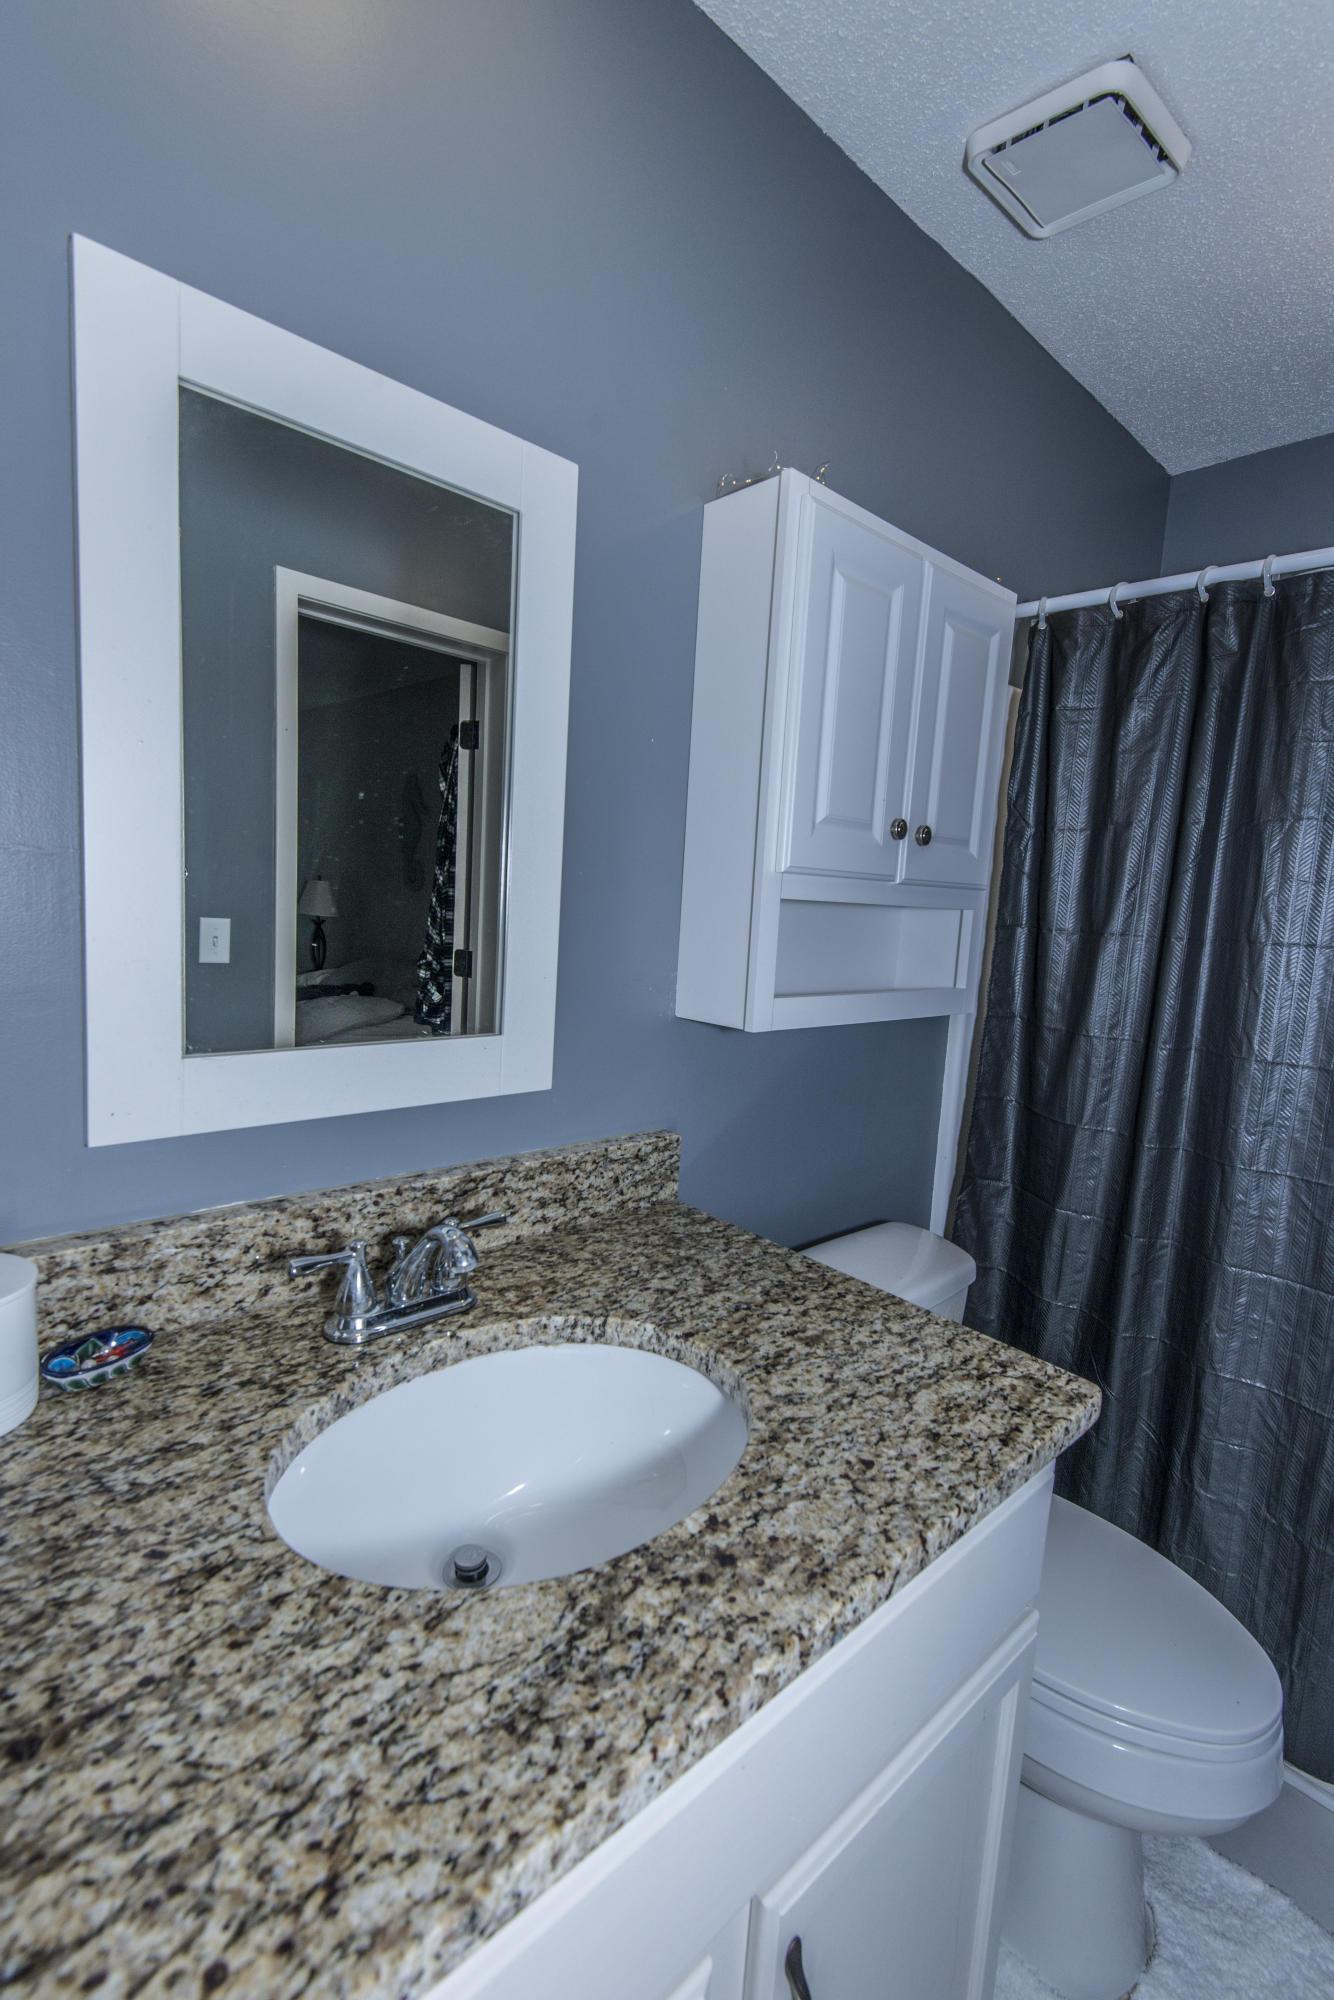 Snee Farm Lakes Homes For Sale - 1140 Hidden Cove, Mount Pleasant, SC - 6